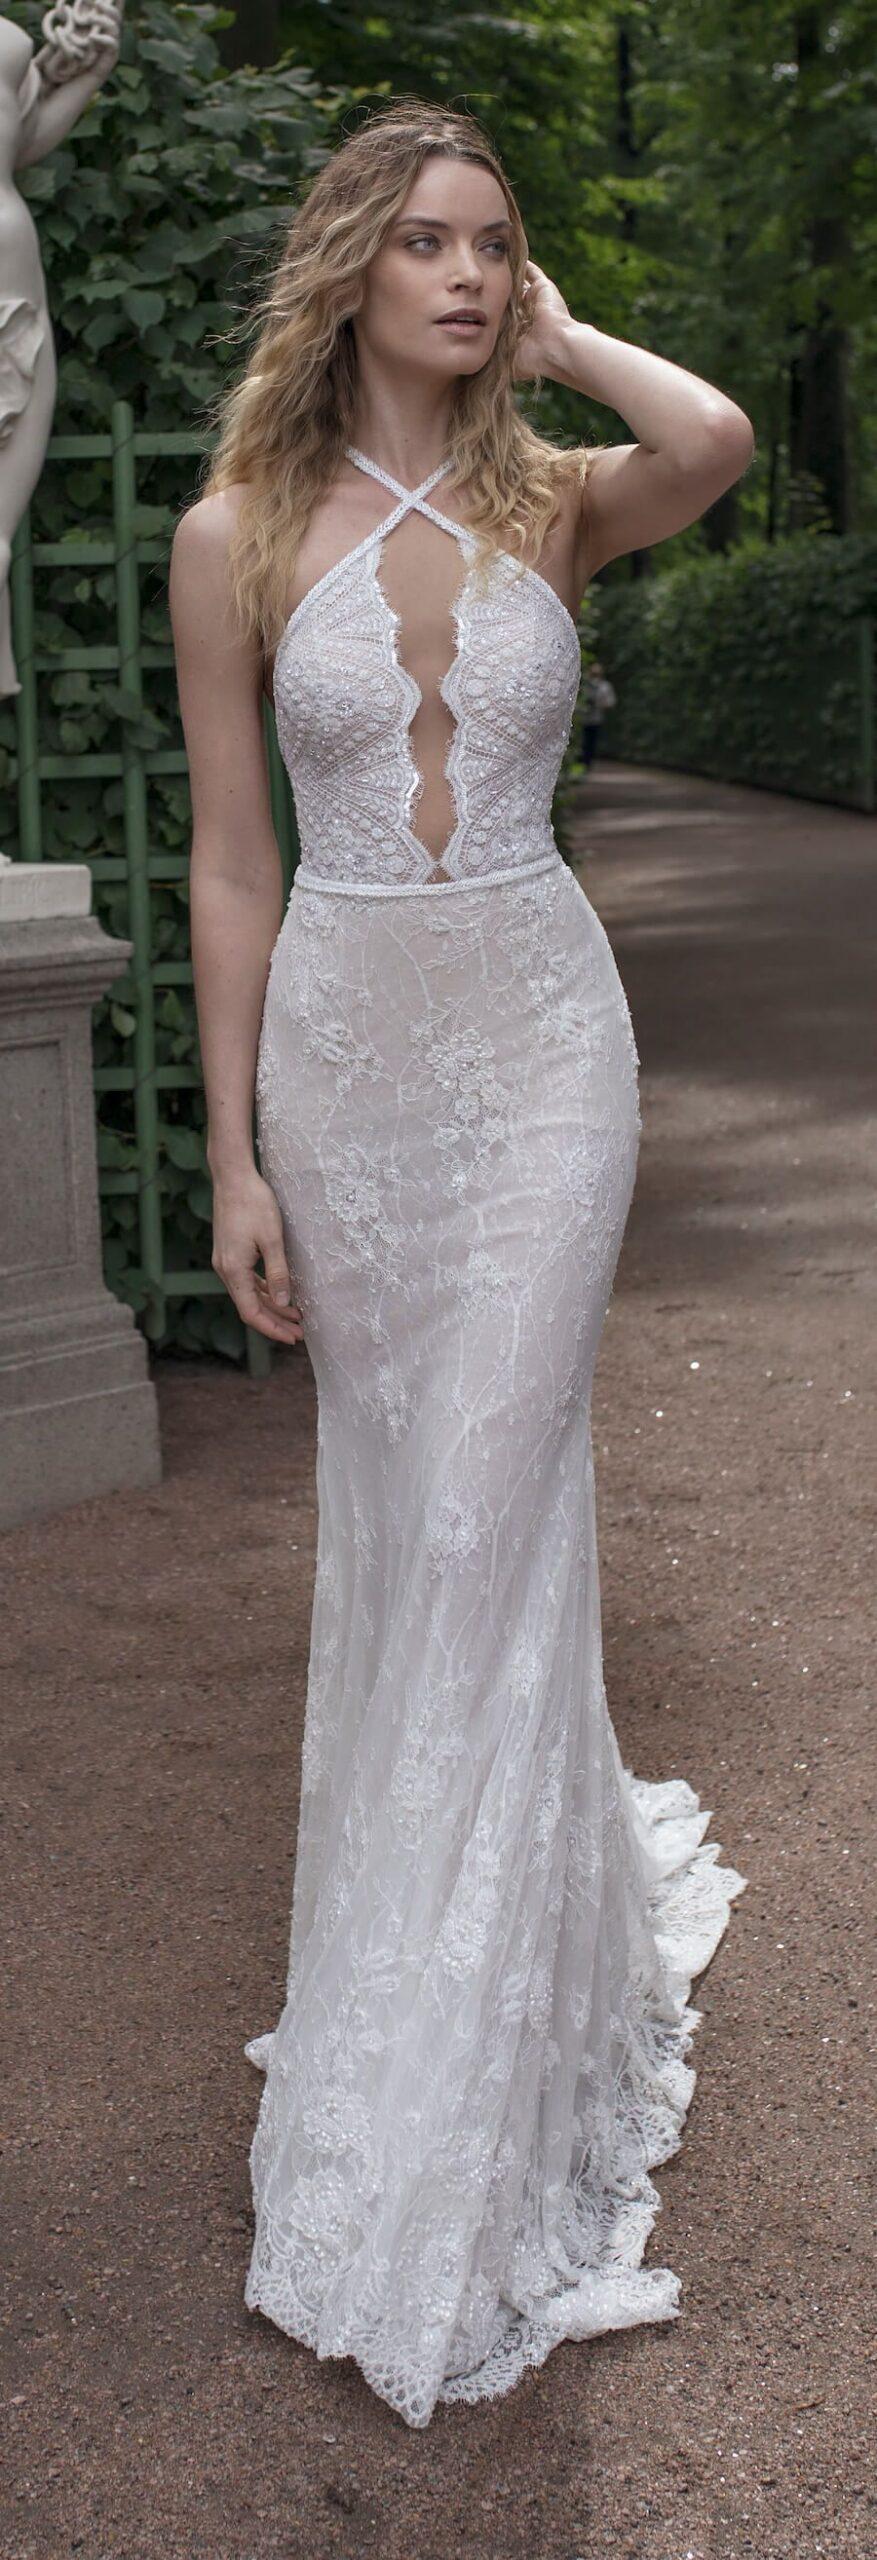 Wedding-Dresses-0744